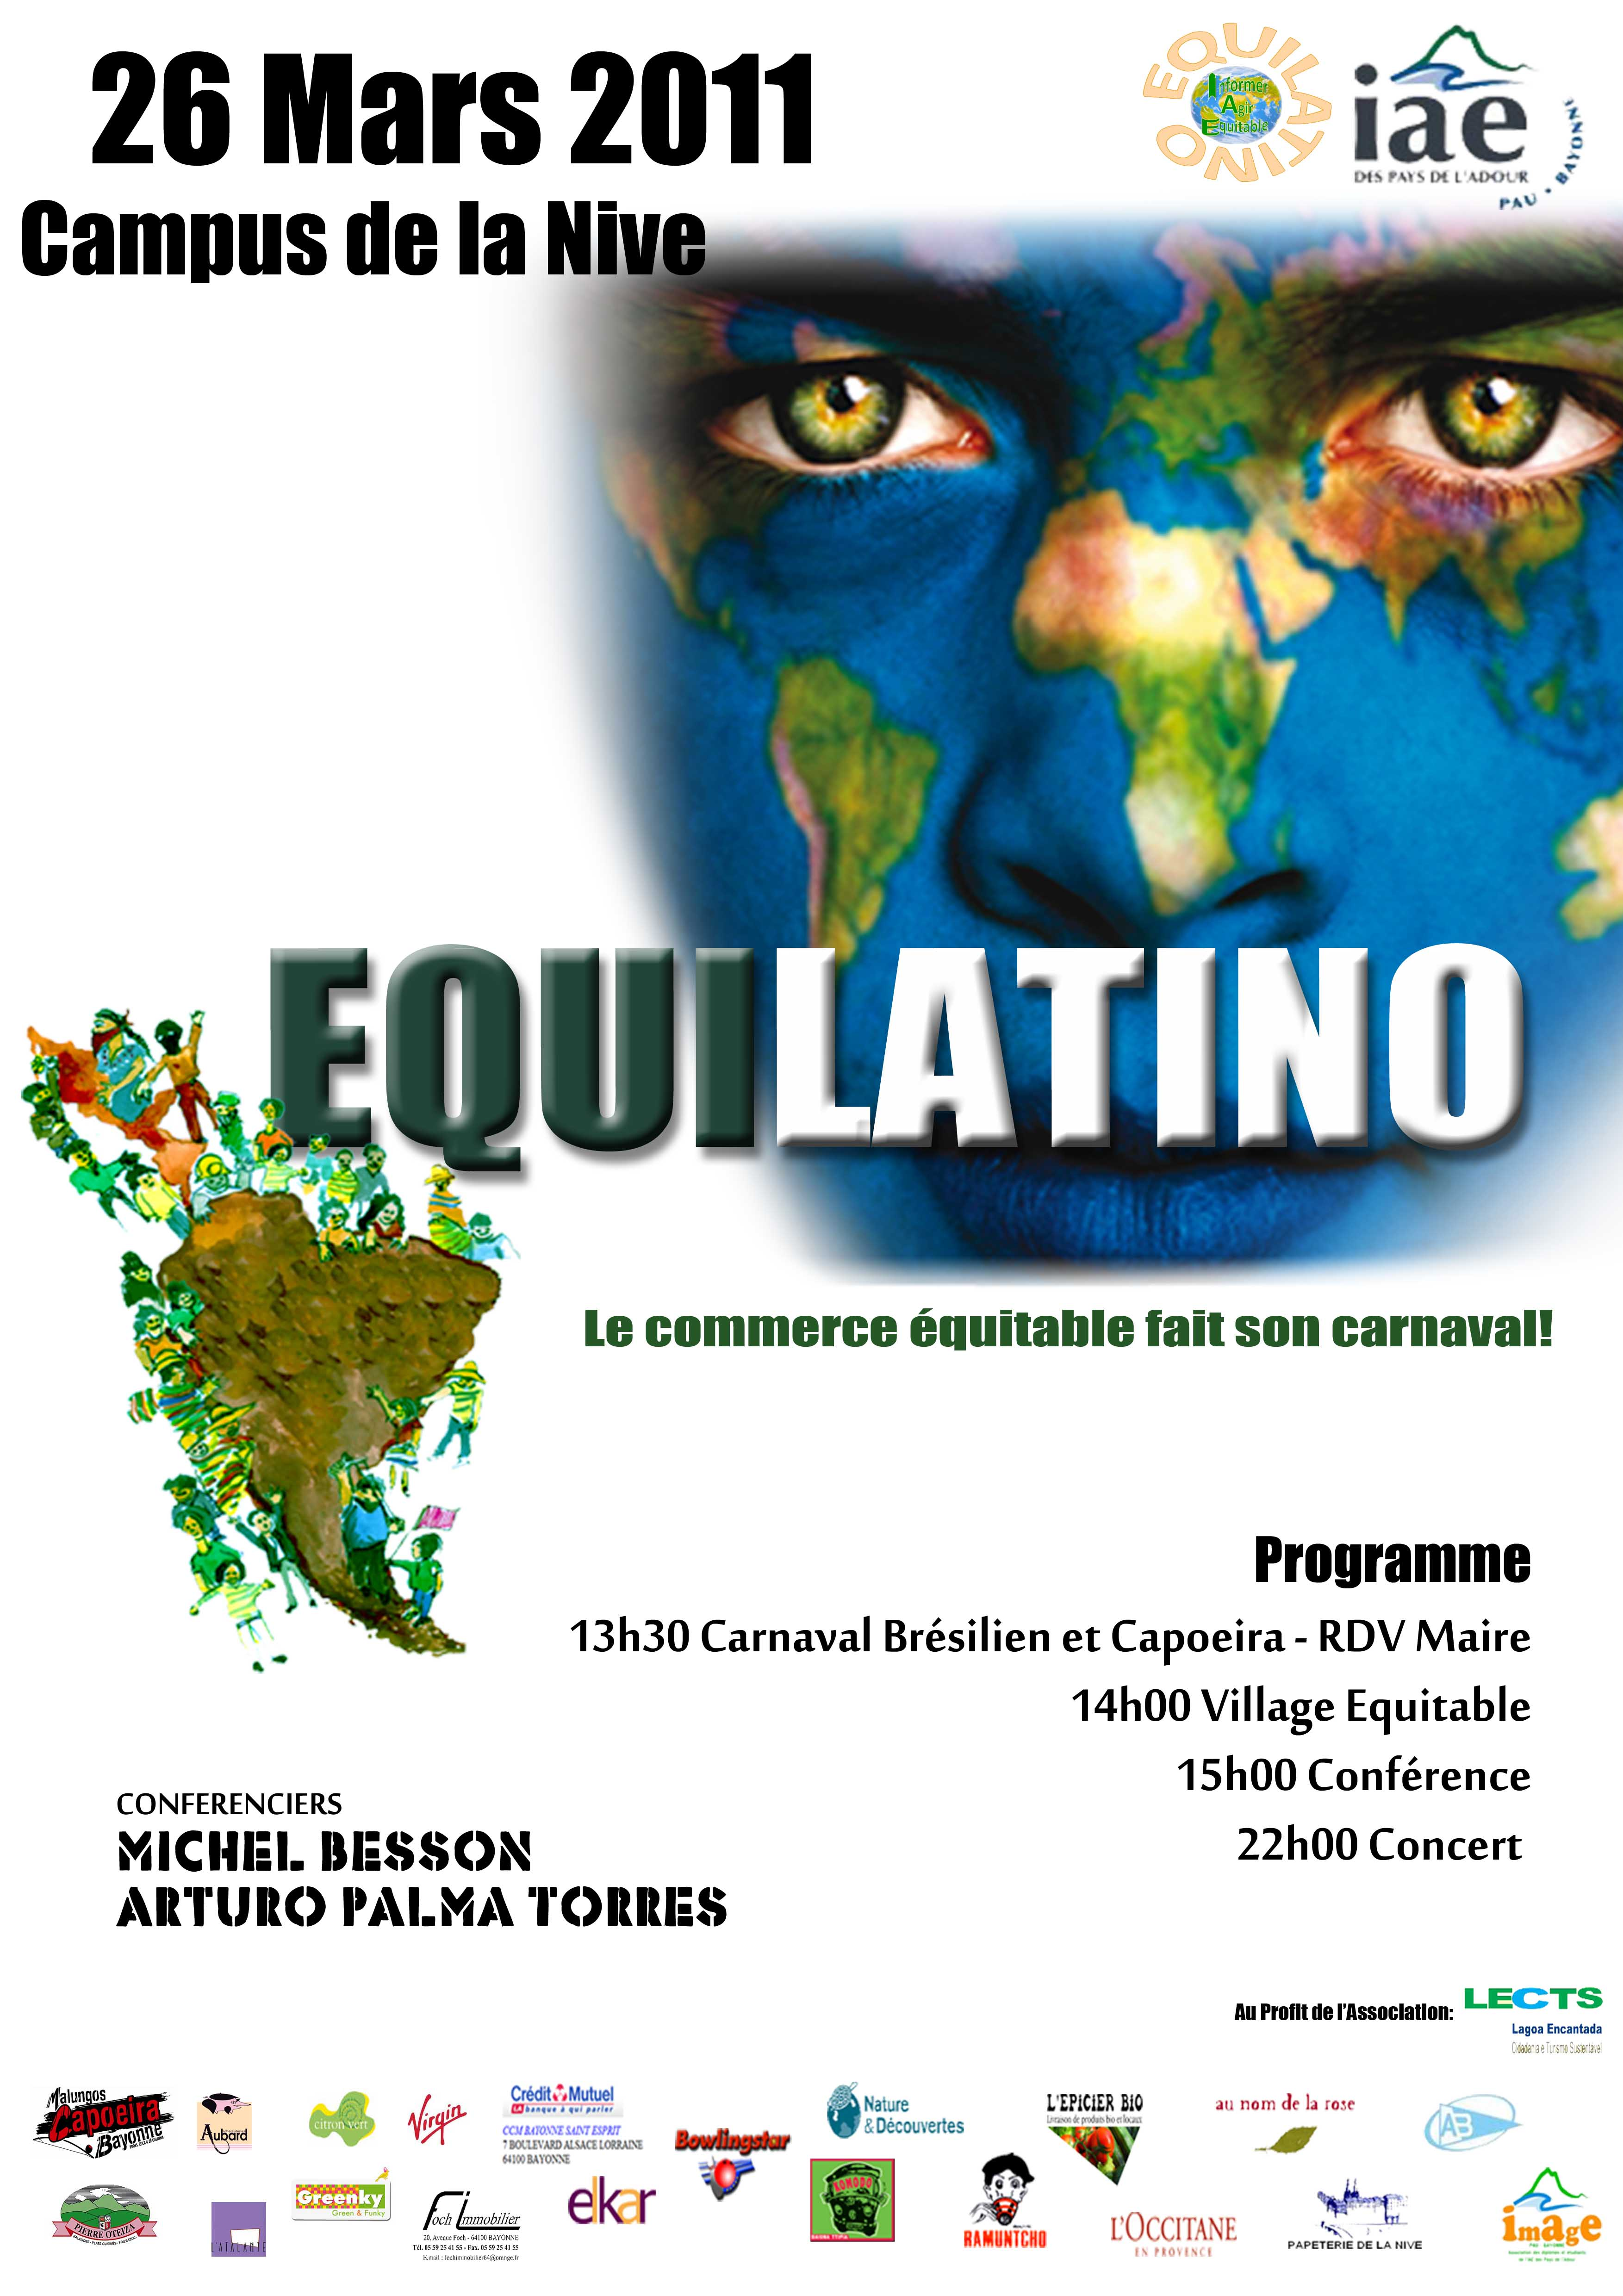 Equilatino : Informer et Agir Equitable – Samedi 26 mars 2011 | IAE ...